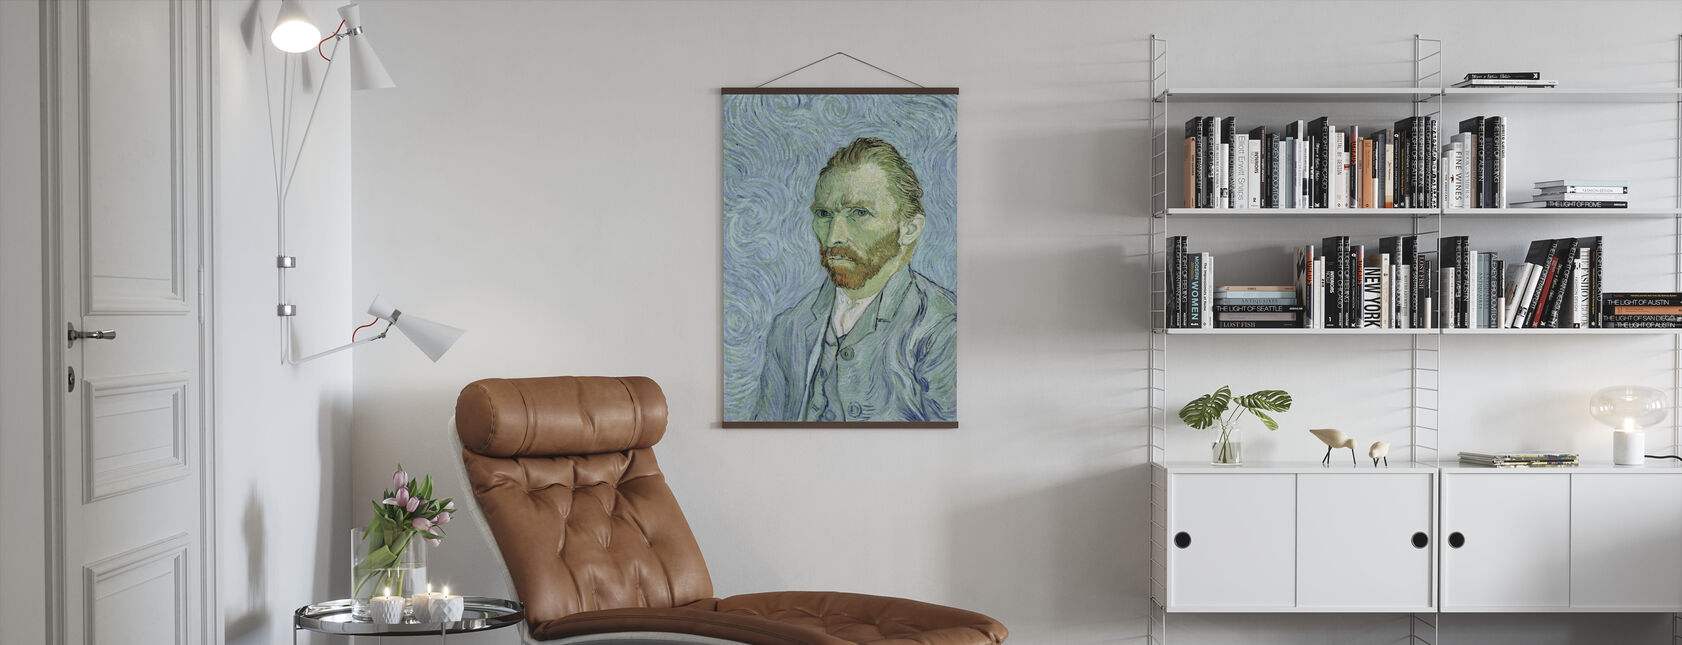 Self portrait, Vincent van Gogh - Poster - Living Room